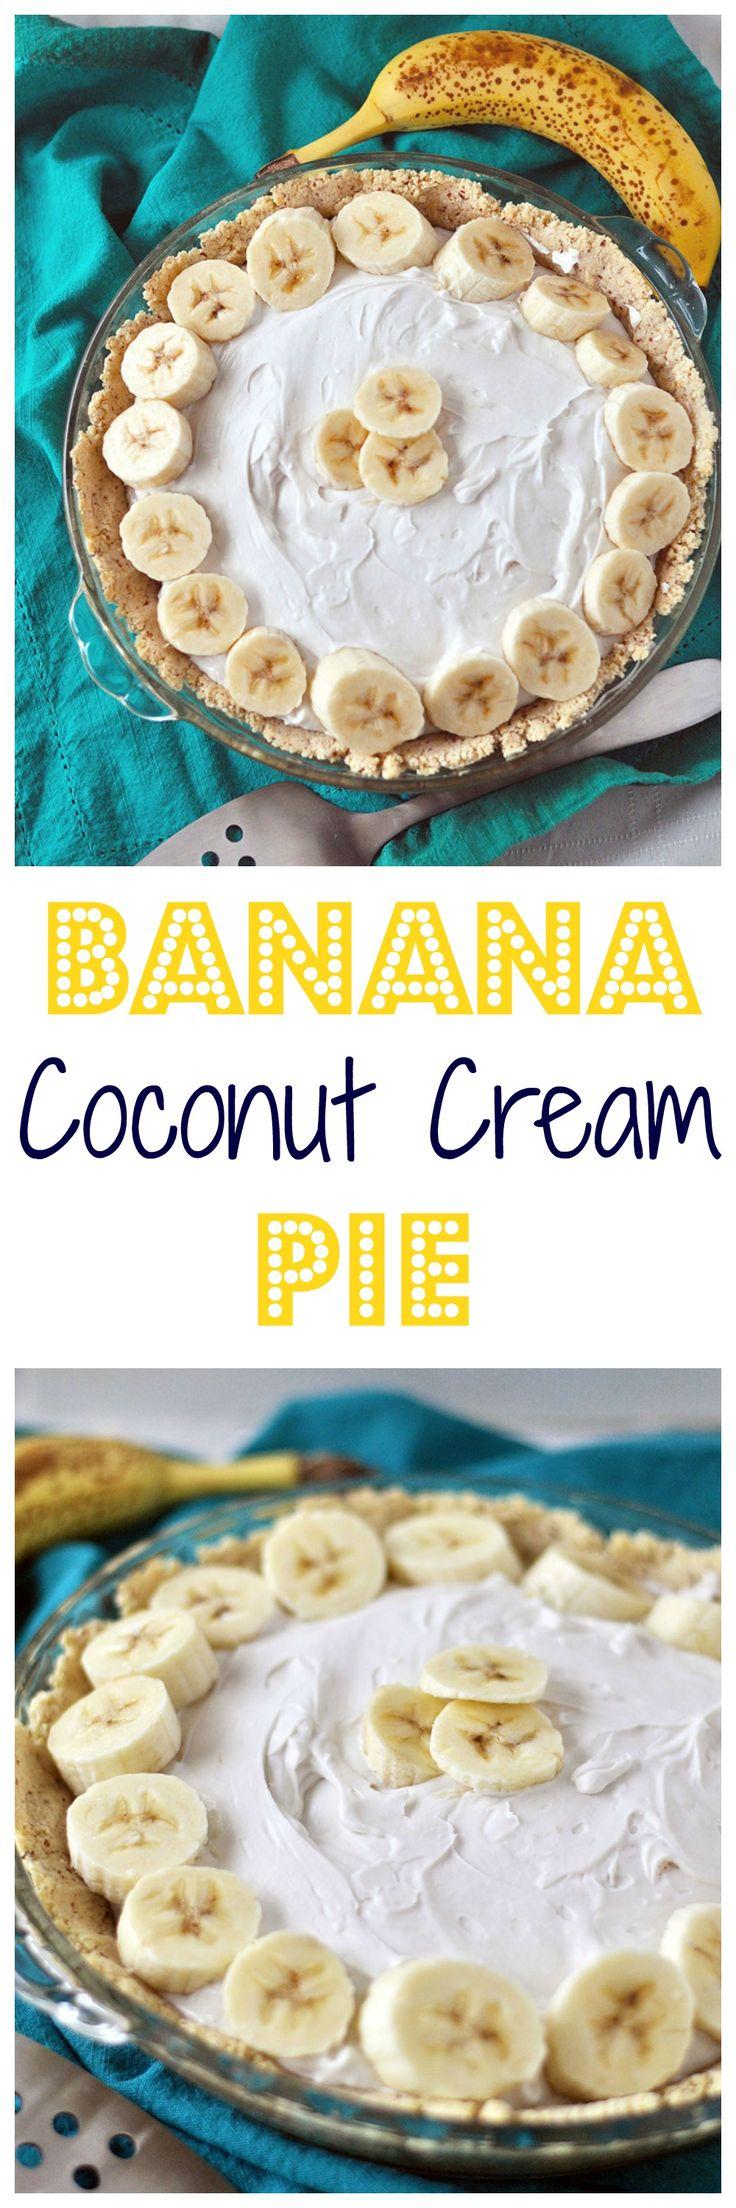 A dreamy creamy banana coconut cream pie. ZERO refined sugar, gluten free, vegan and paleo approved! Easy too.